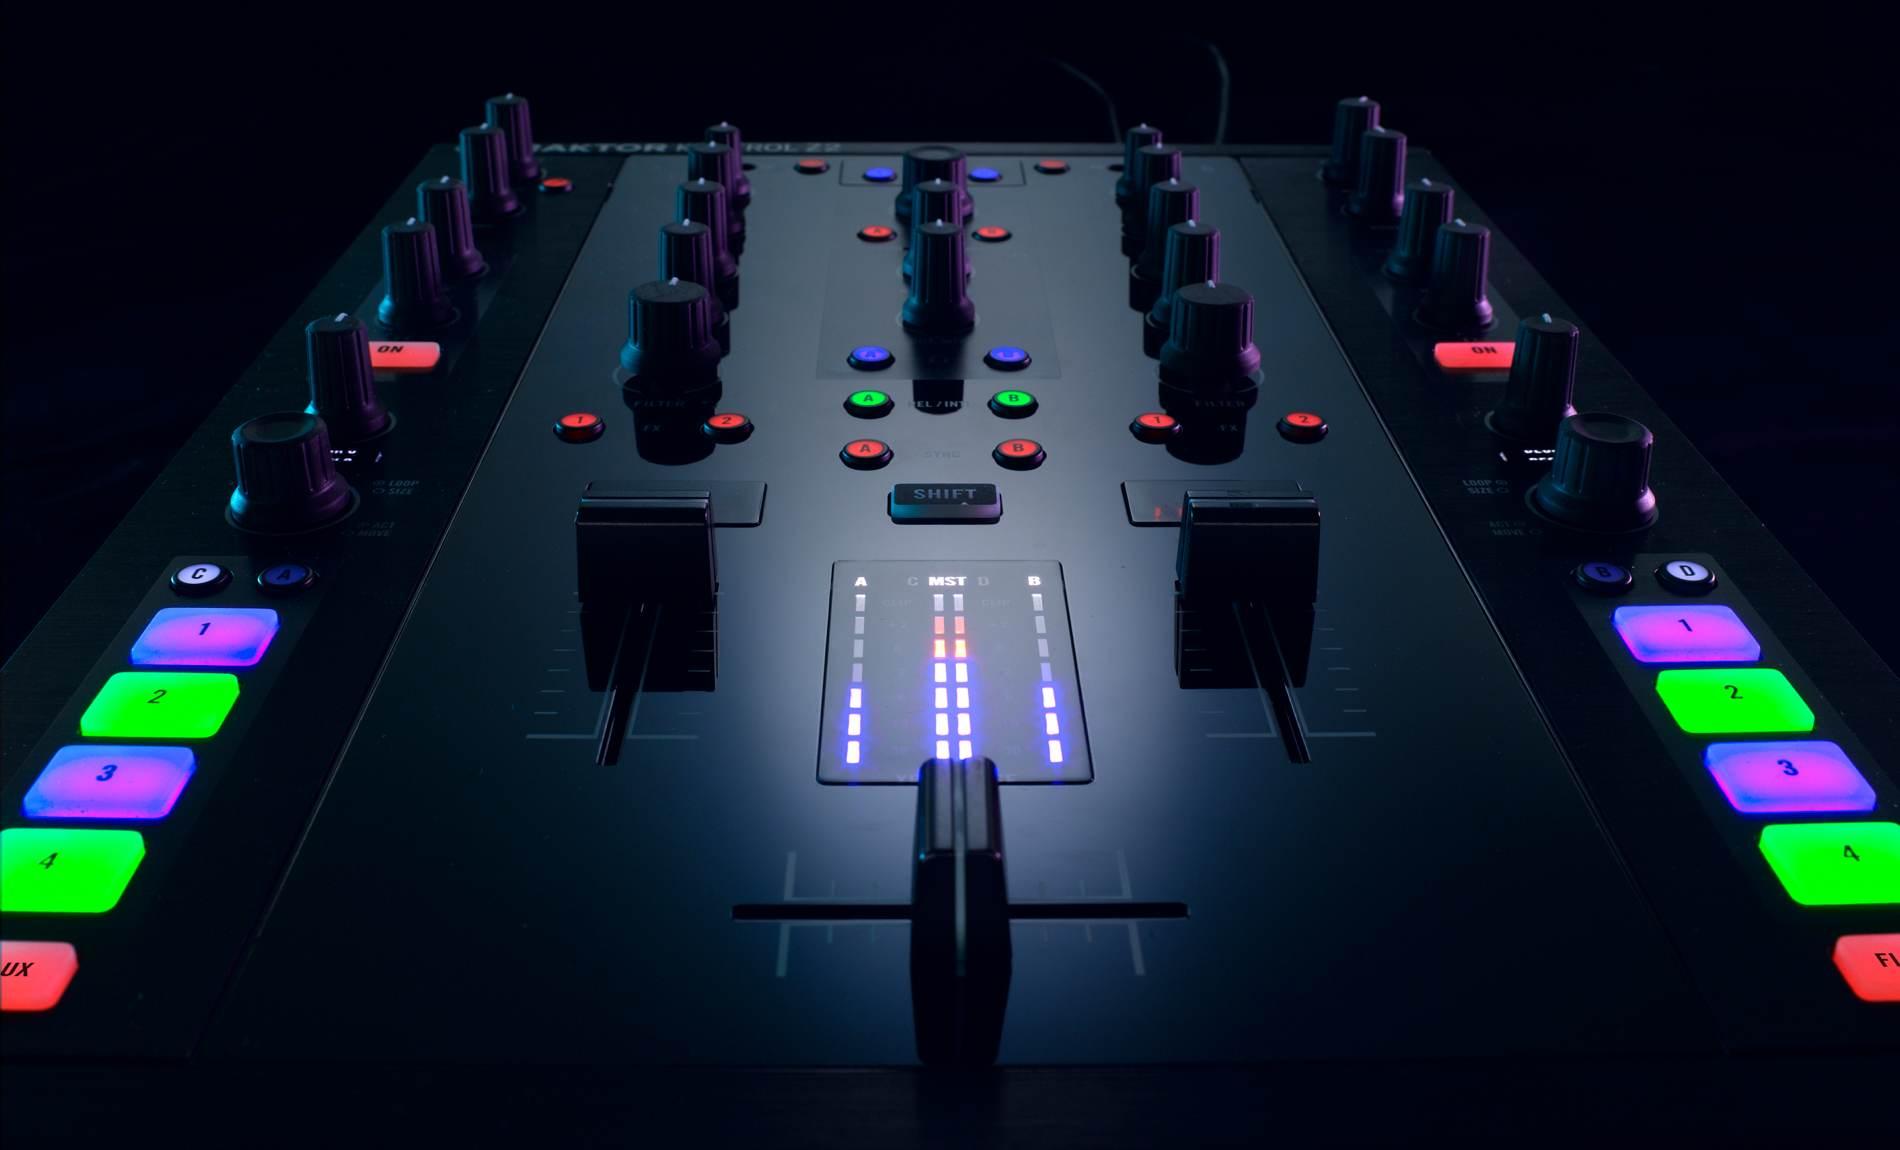 a mixer a soundcard a controller ni traktor kontrol z2 examined gallery details cdm. Black Bedroom Furniture Sets. Home Design Ideas